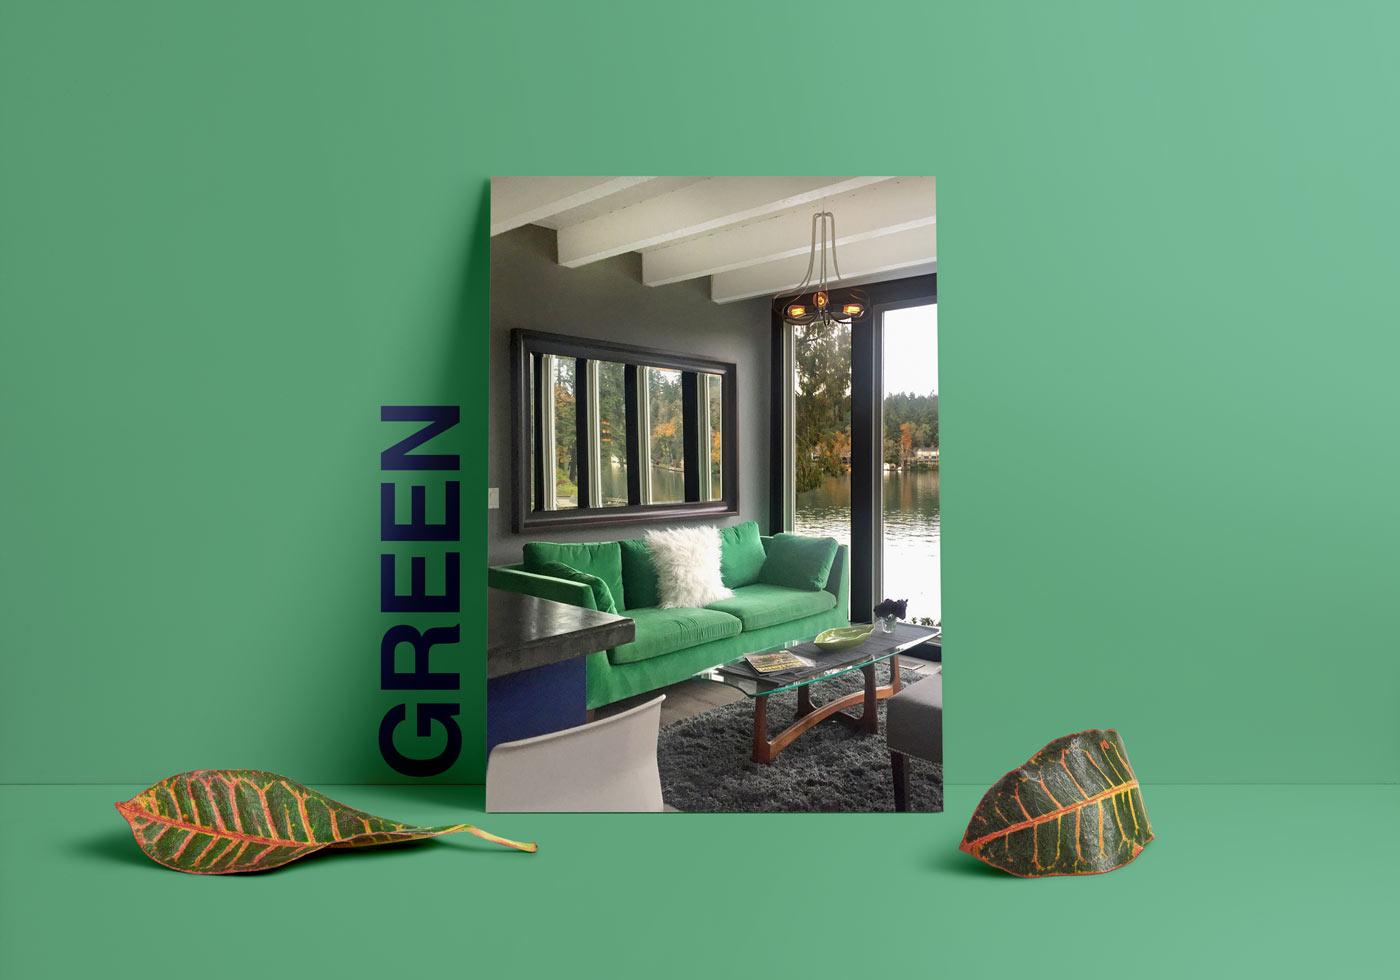 green interior design - طبع یا مزاج رنگ ها در دکوراسیون داخلی